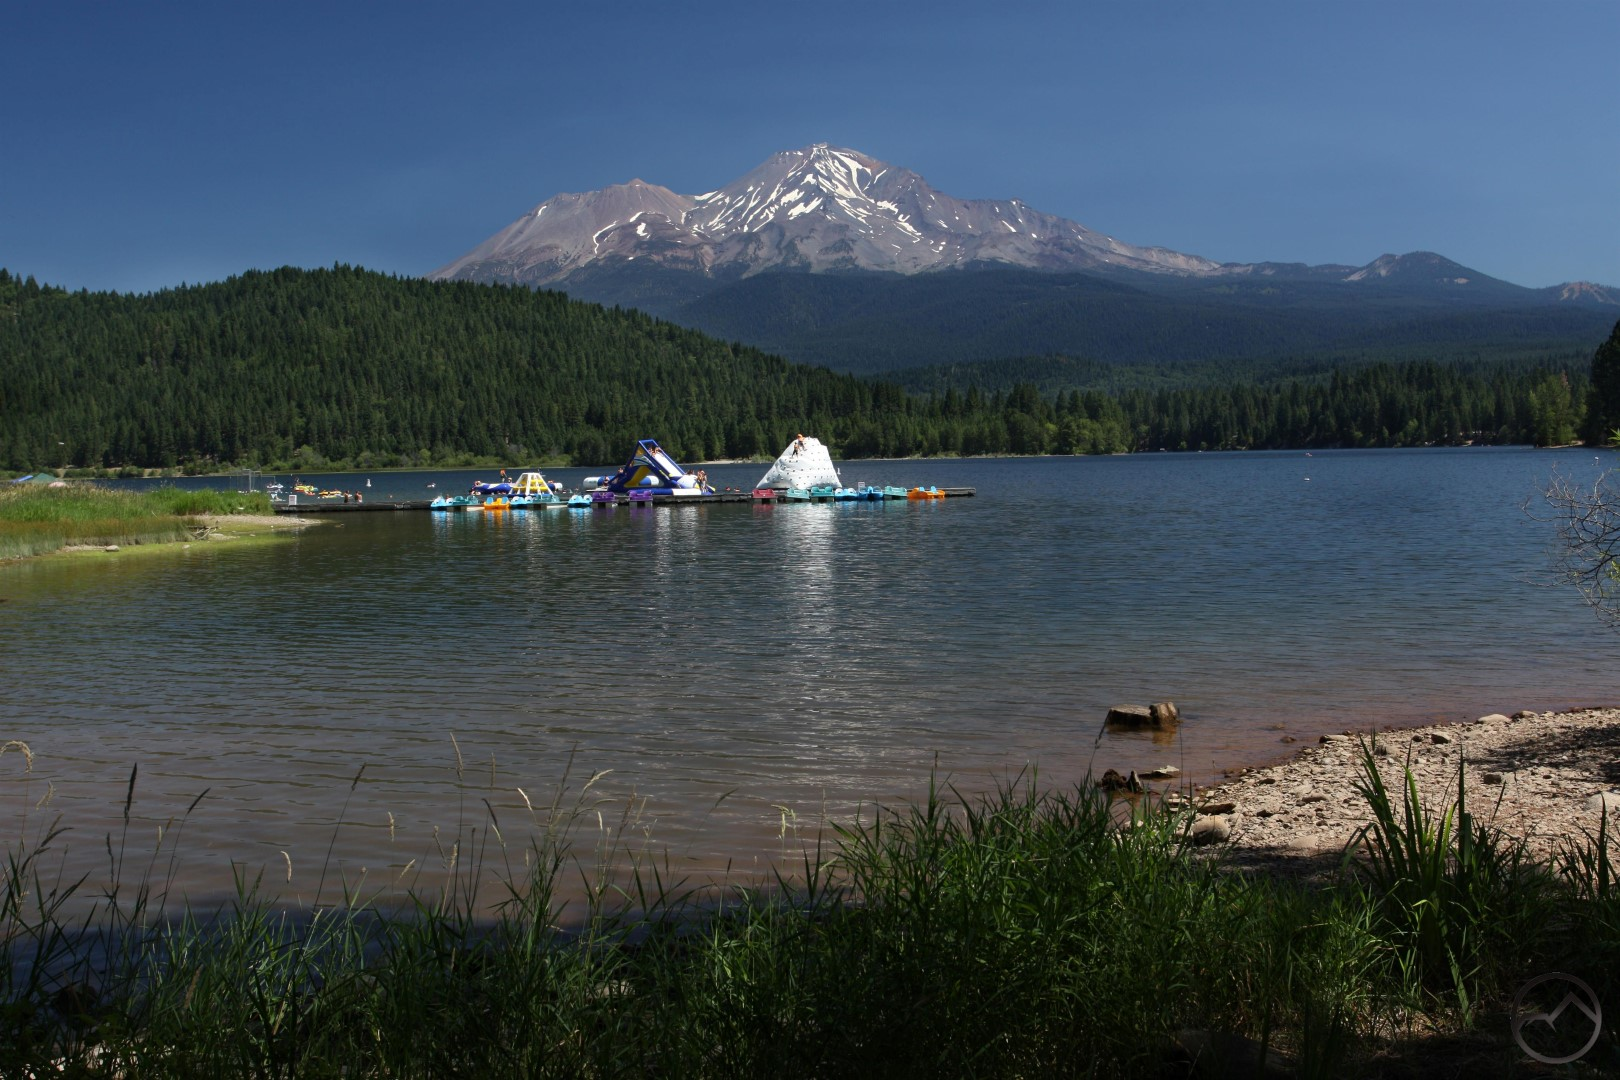 Lake siskiyou and shastina the fishing advice for Lake siskiyou resort cabins